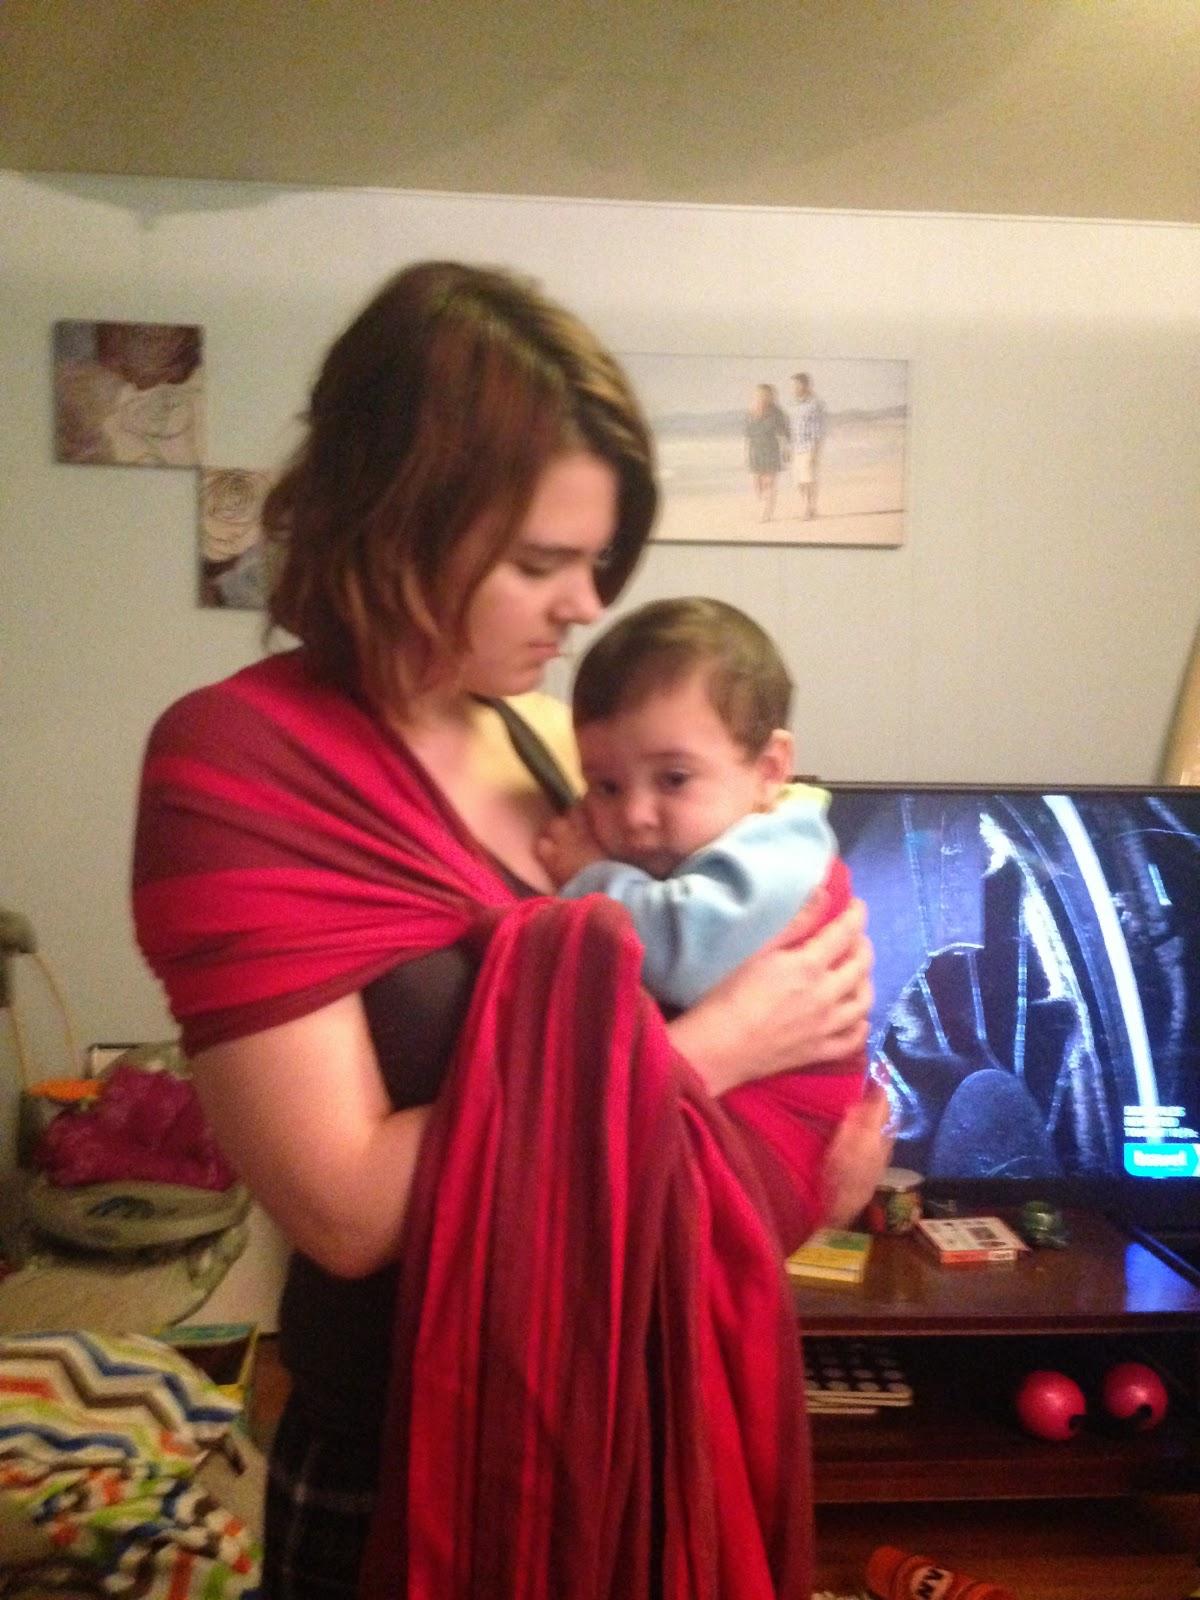 Vegan Babymama Our Babywearing Journey So Far